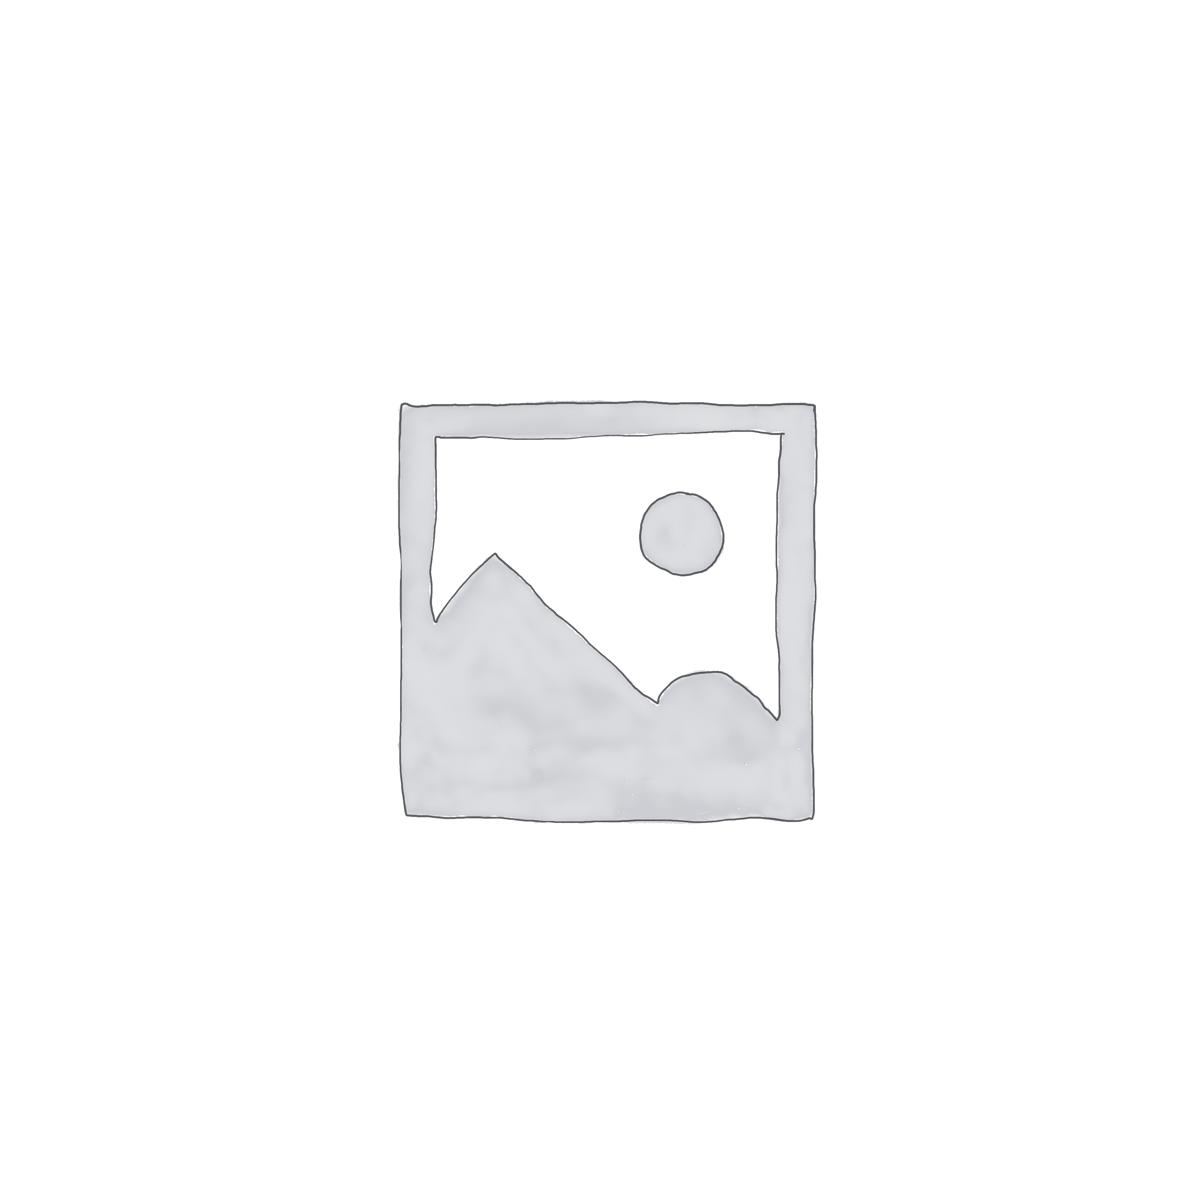 Mountain Landscape Silhouette